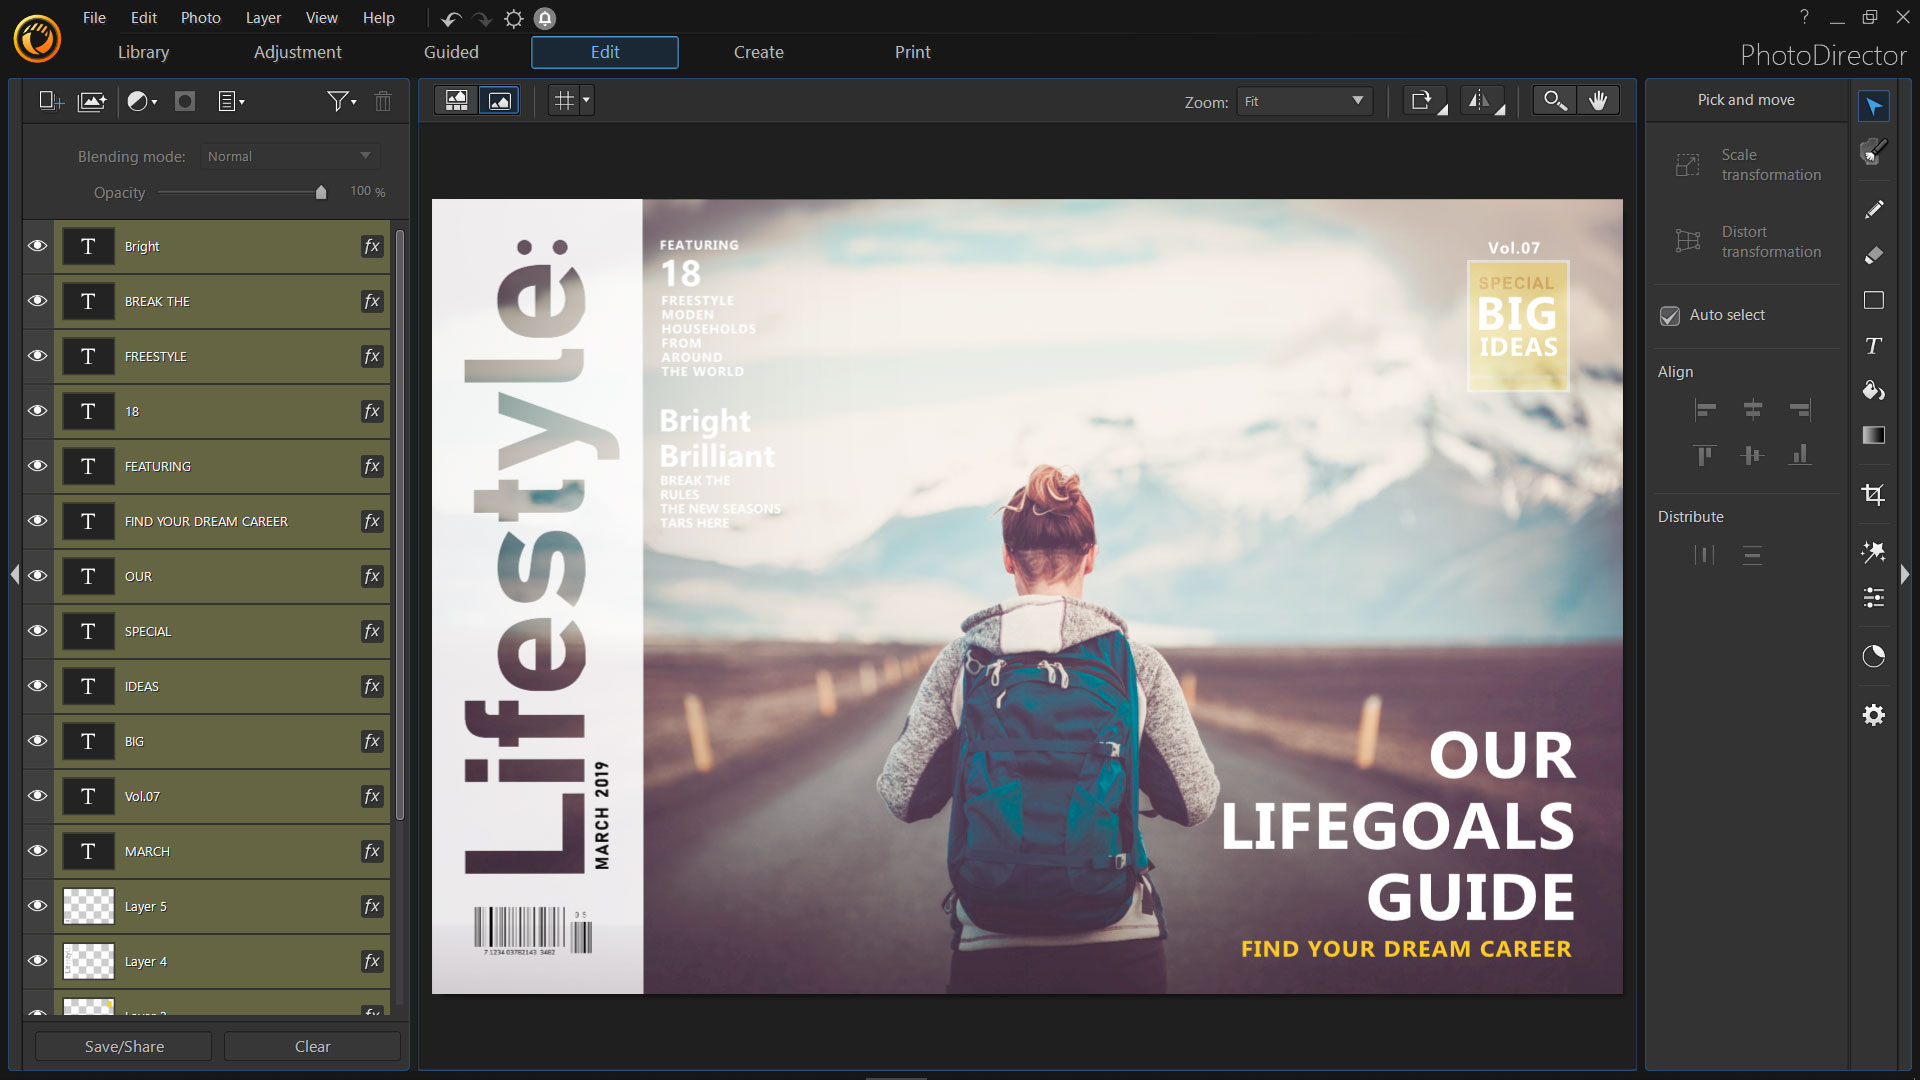 CyberLink: PowerDirector 18 and PhotoDirector 11 released 4